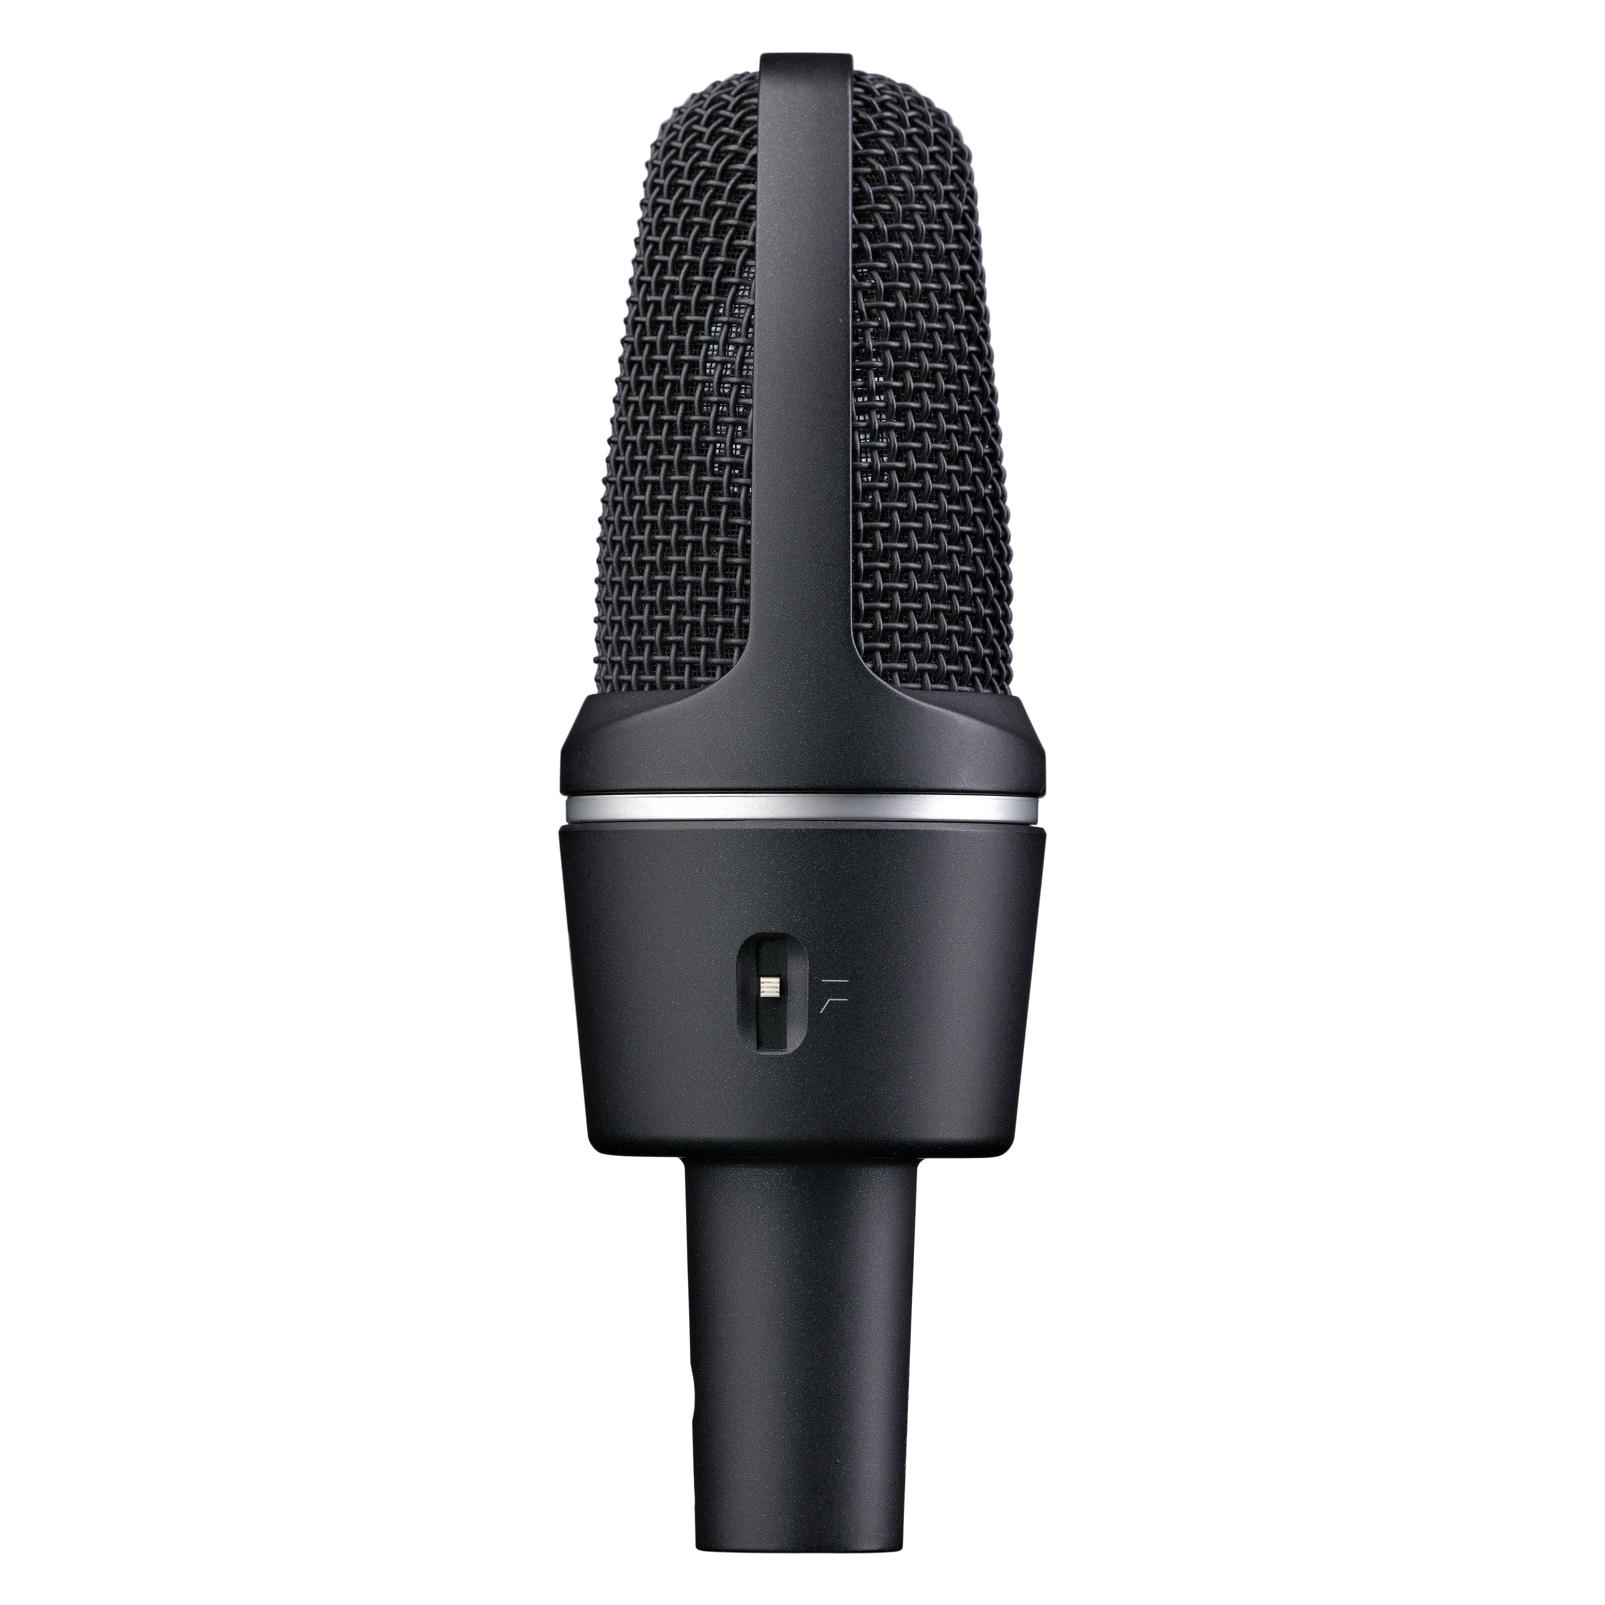 C3000 - Black - High-performance large-diaphragm condenser microphone - Left